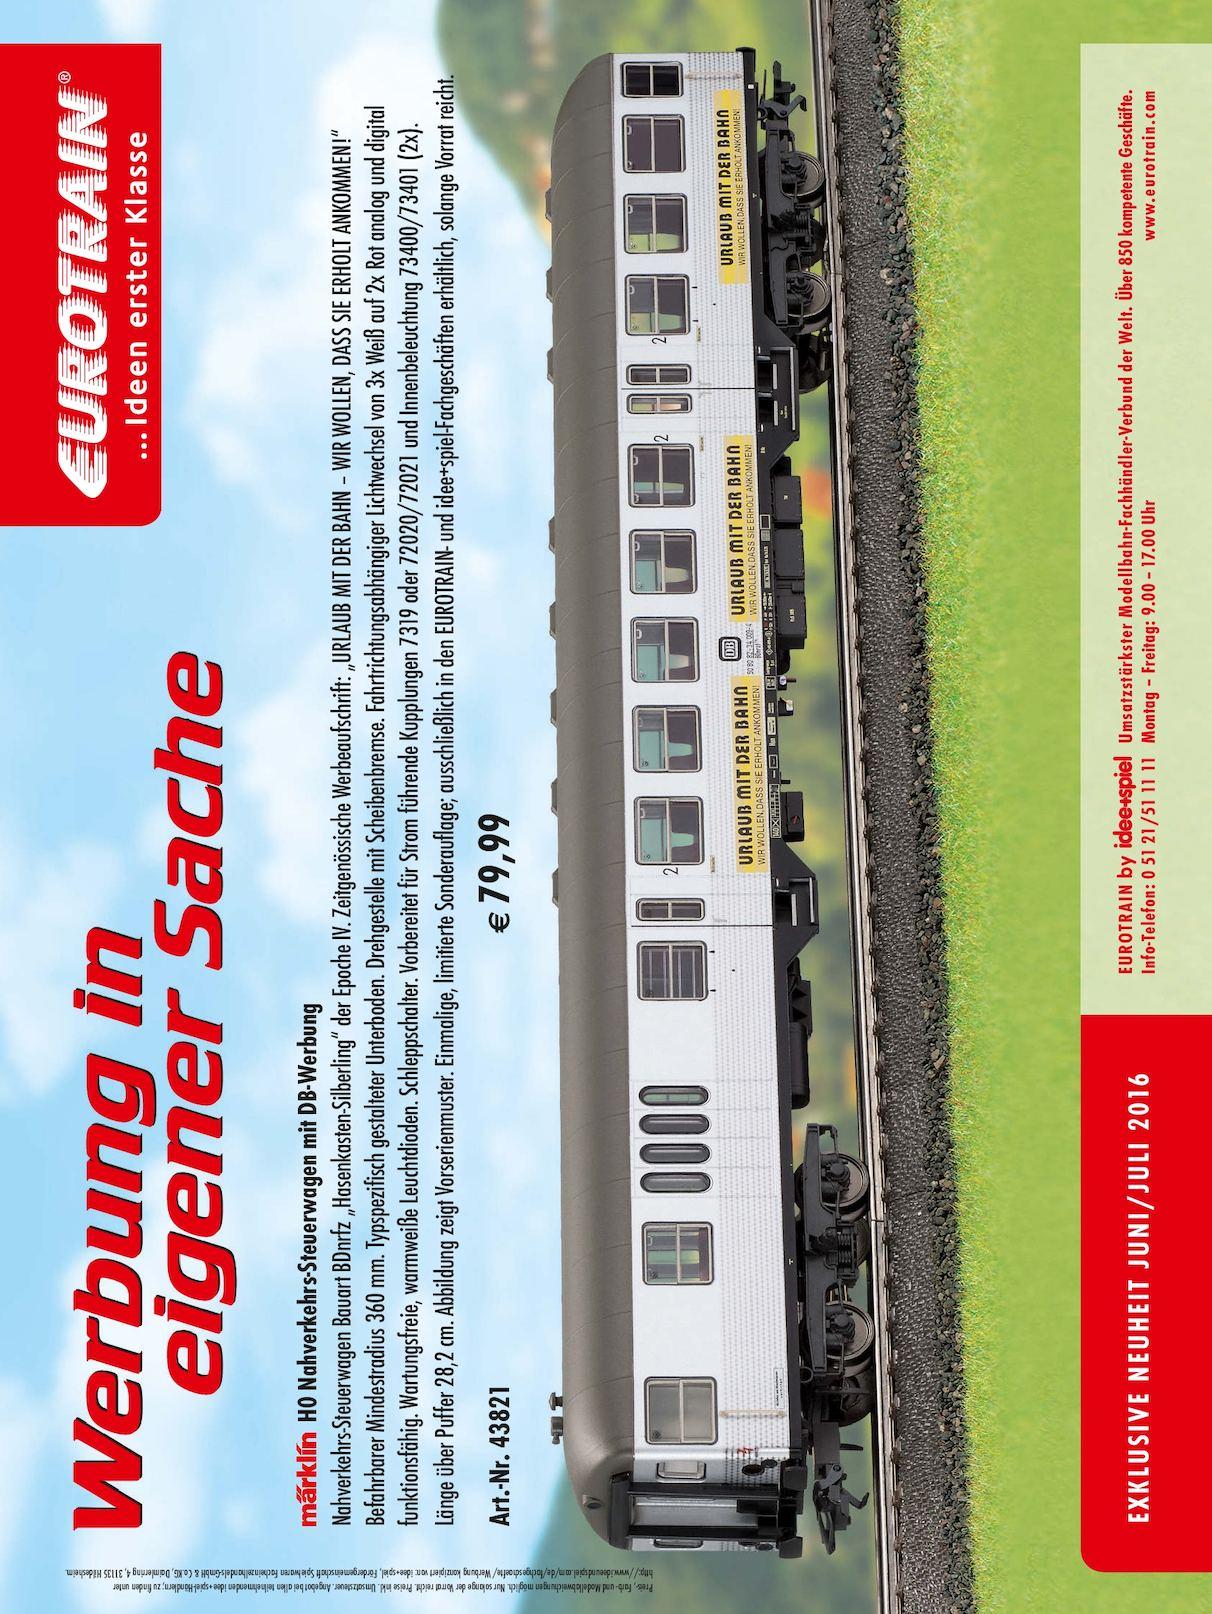 Eisenbahn Modellbahn Magazin 25 25   CALAMEO Downloader